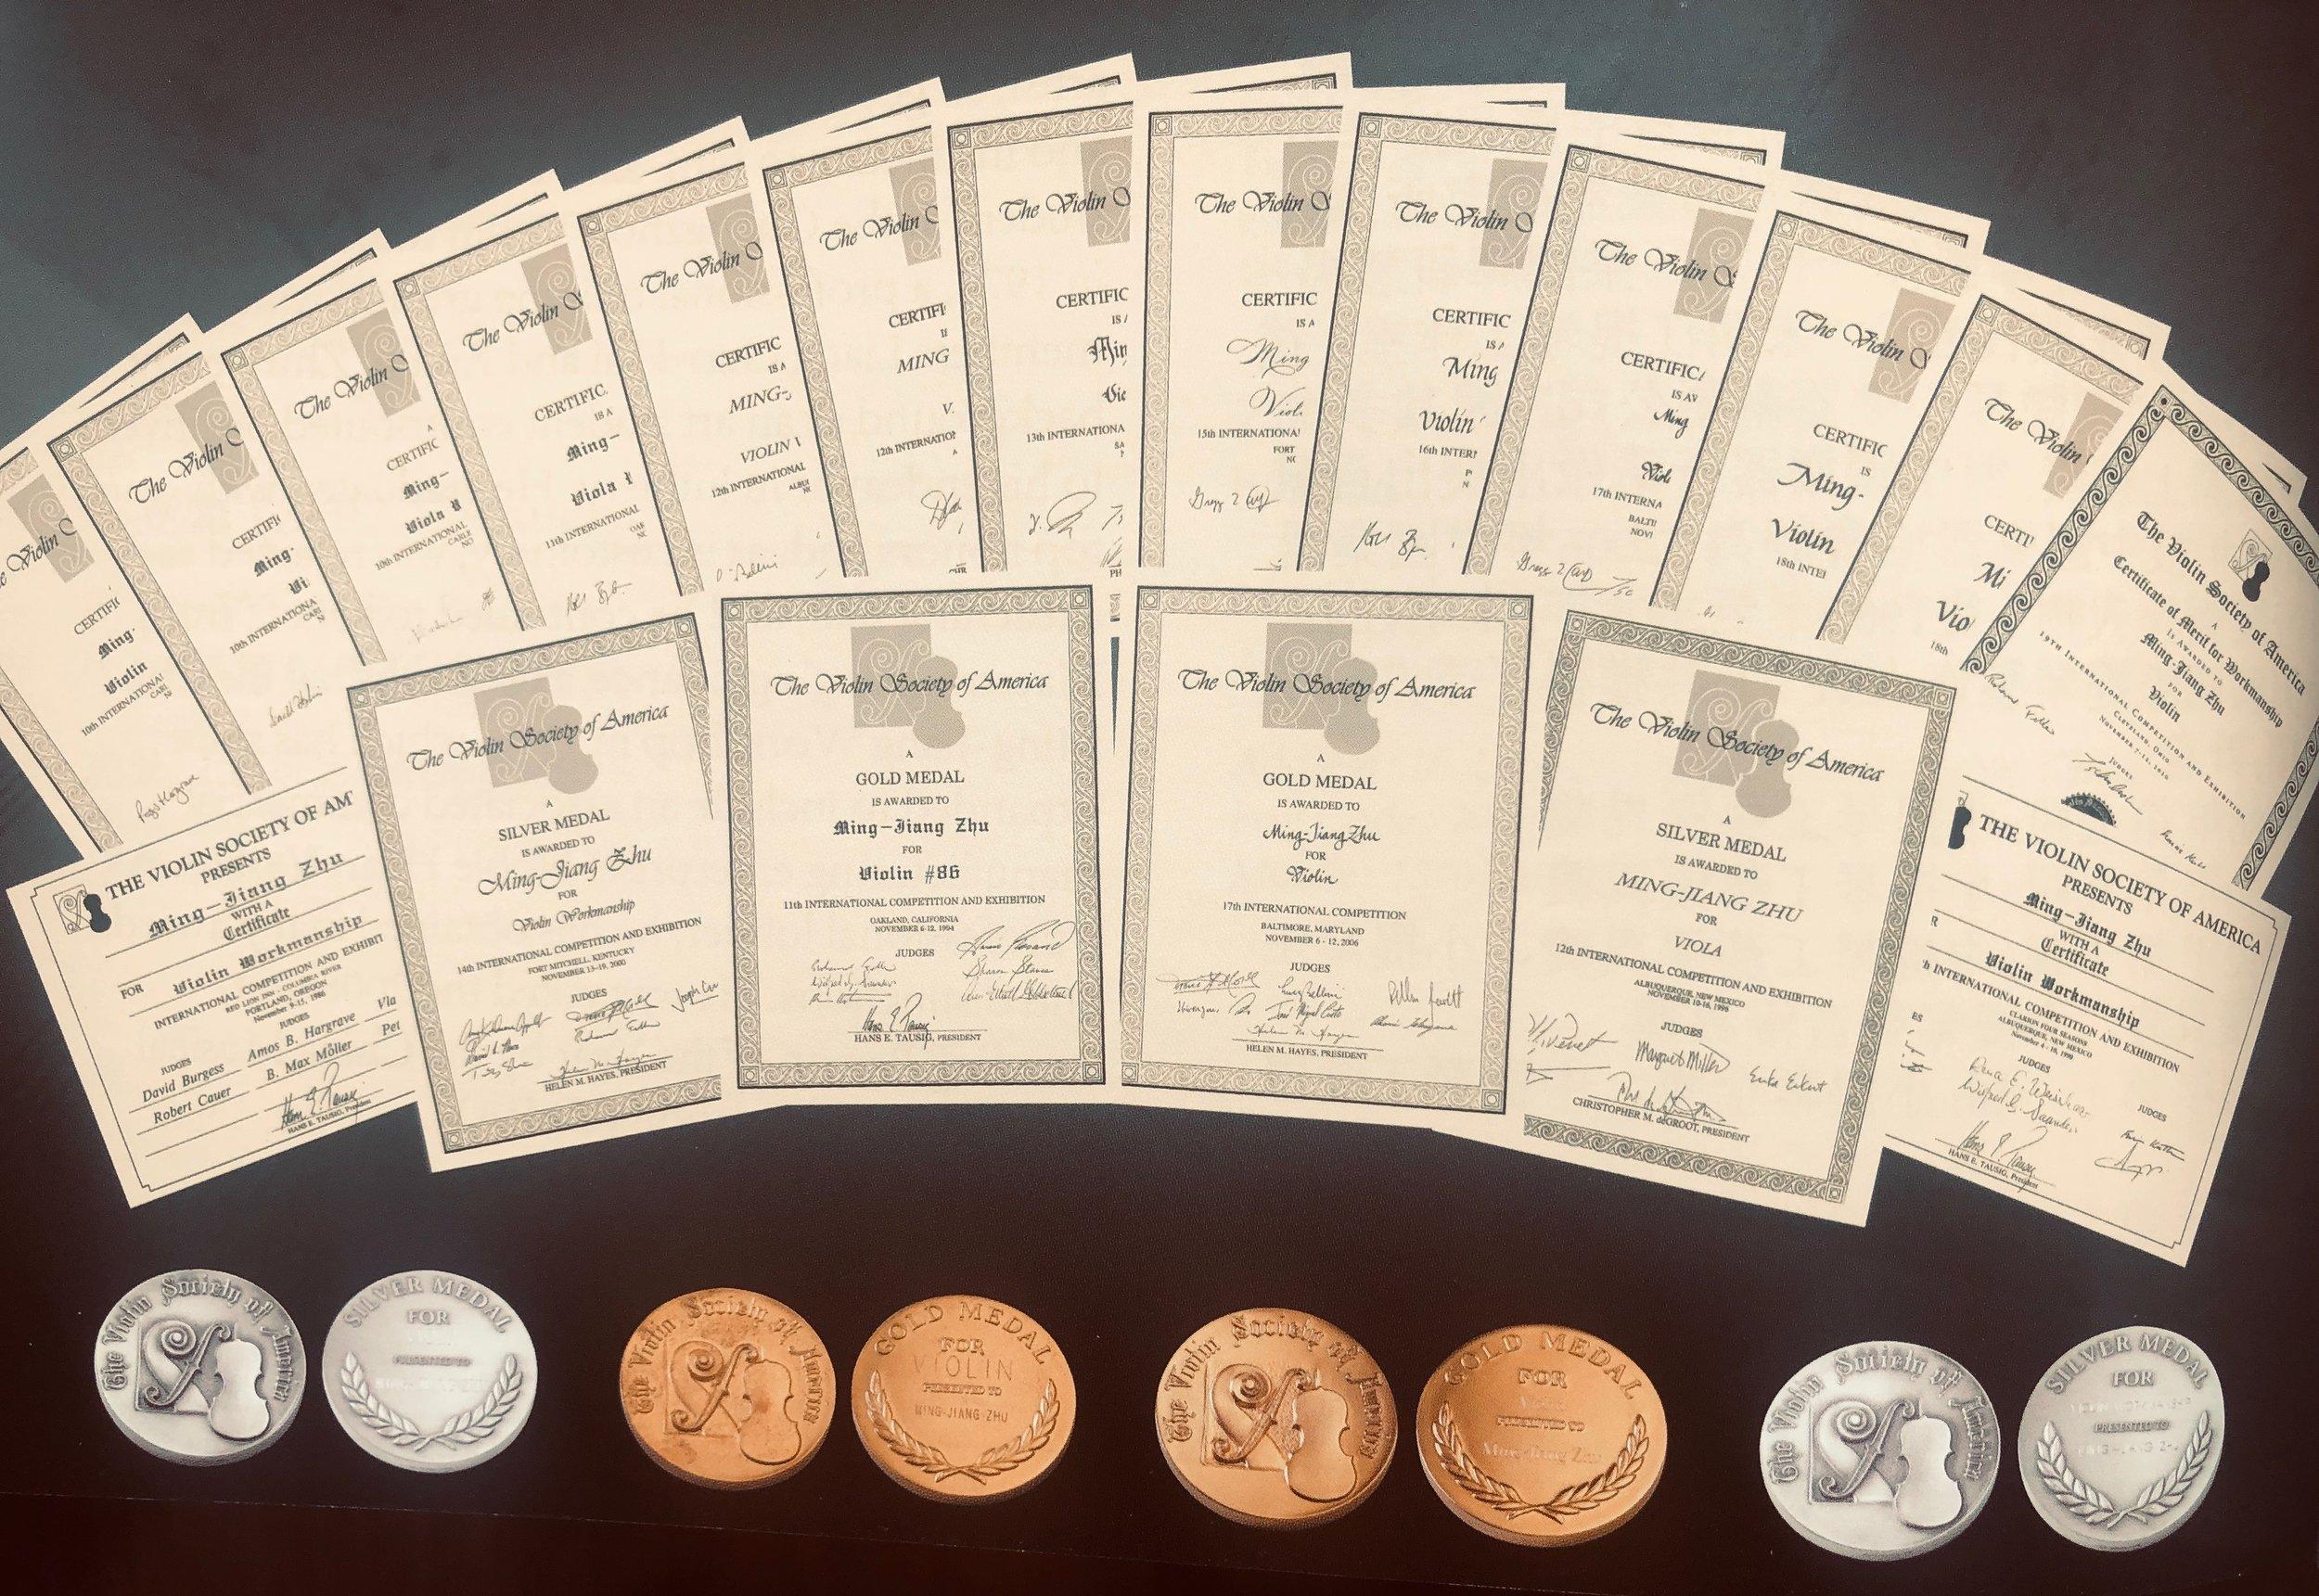 Awards from the violin society of america (vsa0 competition awarded to master chinese violinmaker Ming-Jiang Zhu (朱明江)